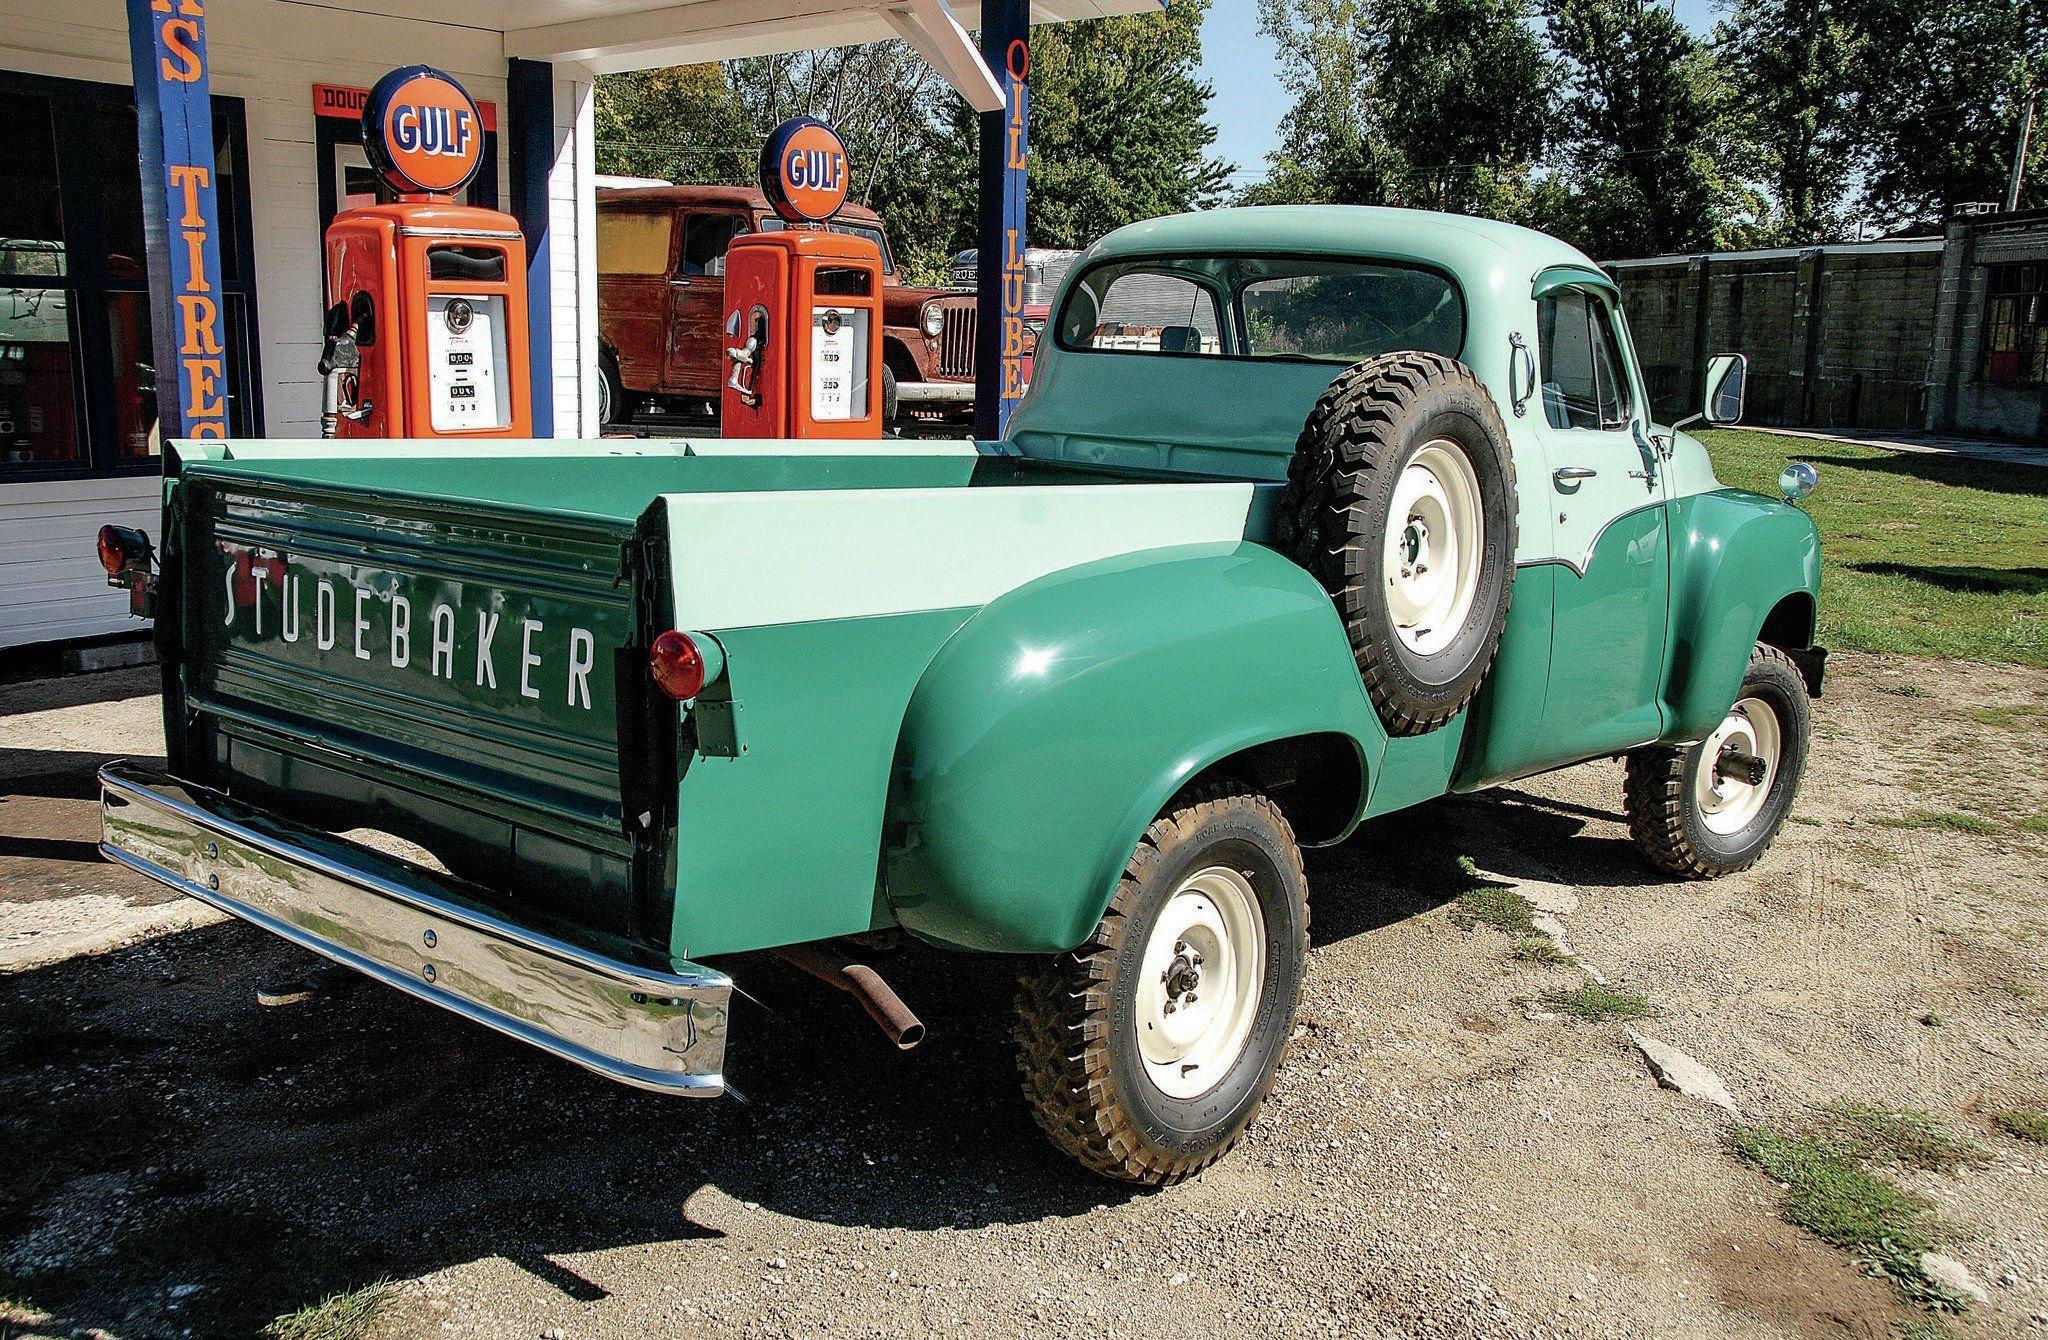 1958 STUDEBAKER TRANSTAR 3E6D offroad 4x4 custom truck pickup retro ...